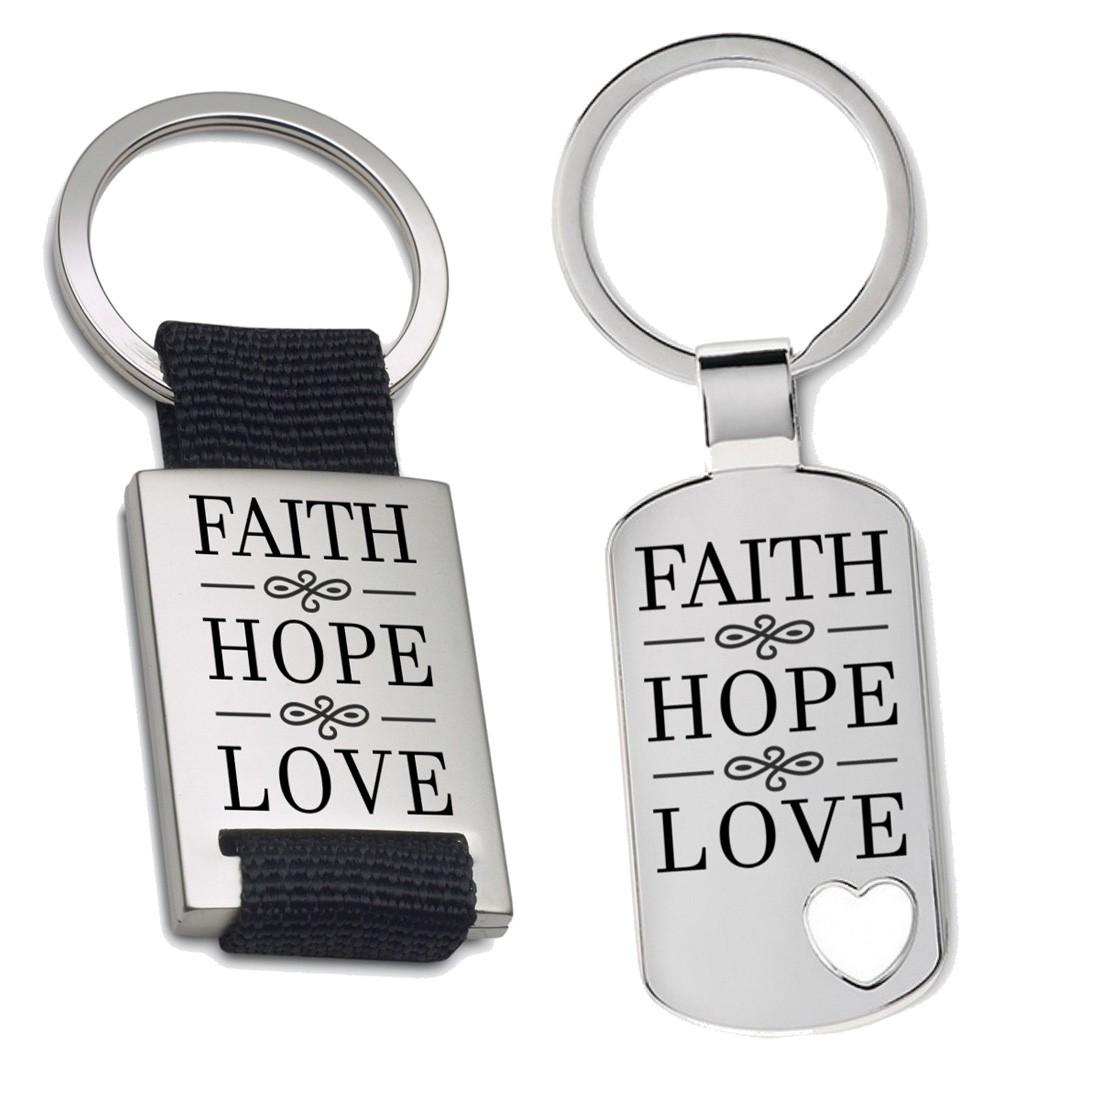 Schlüsselanhänger: Faith hope love